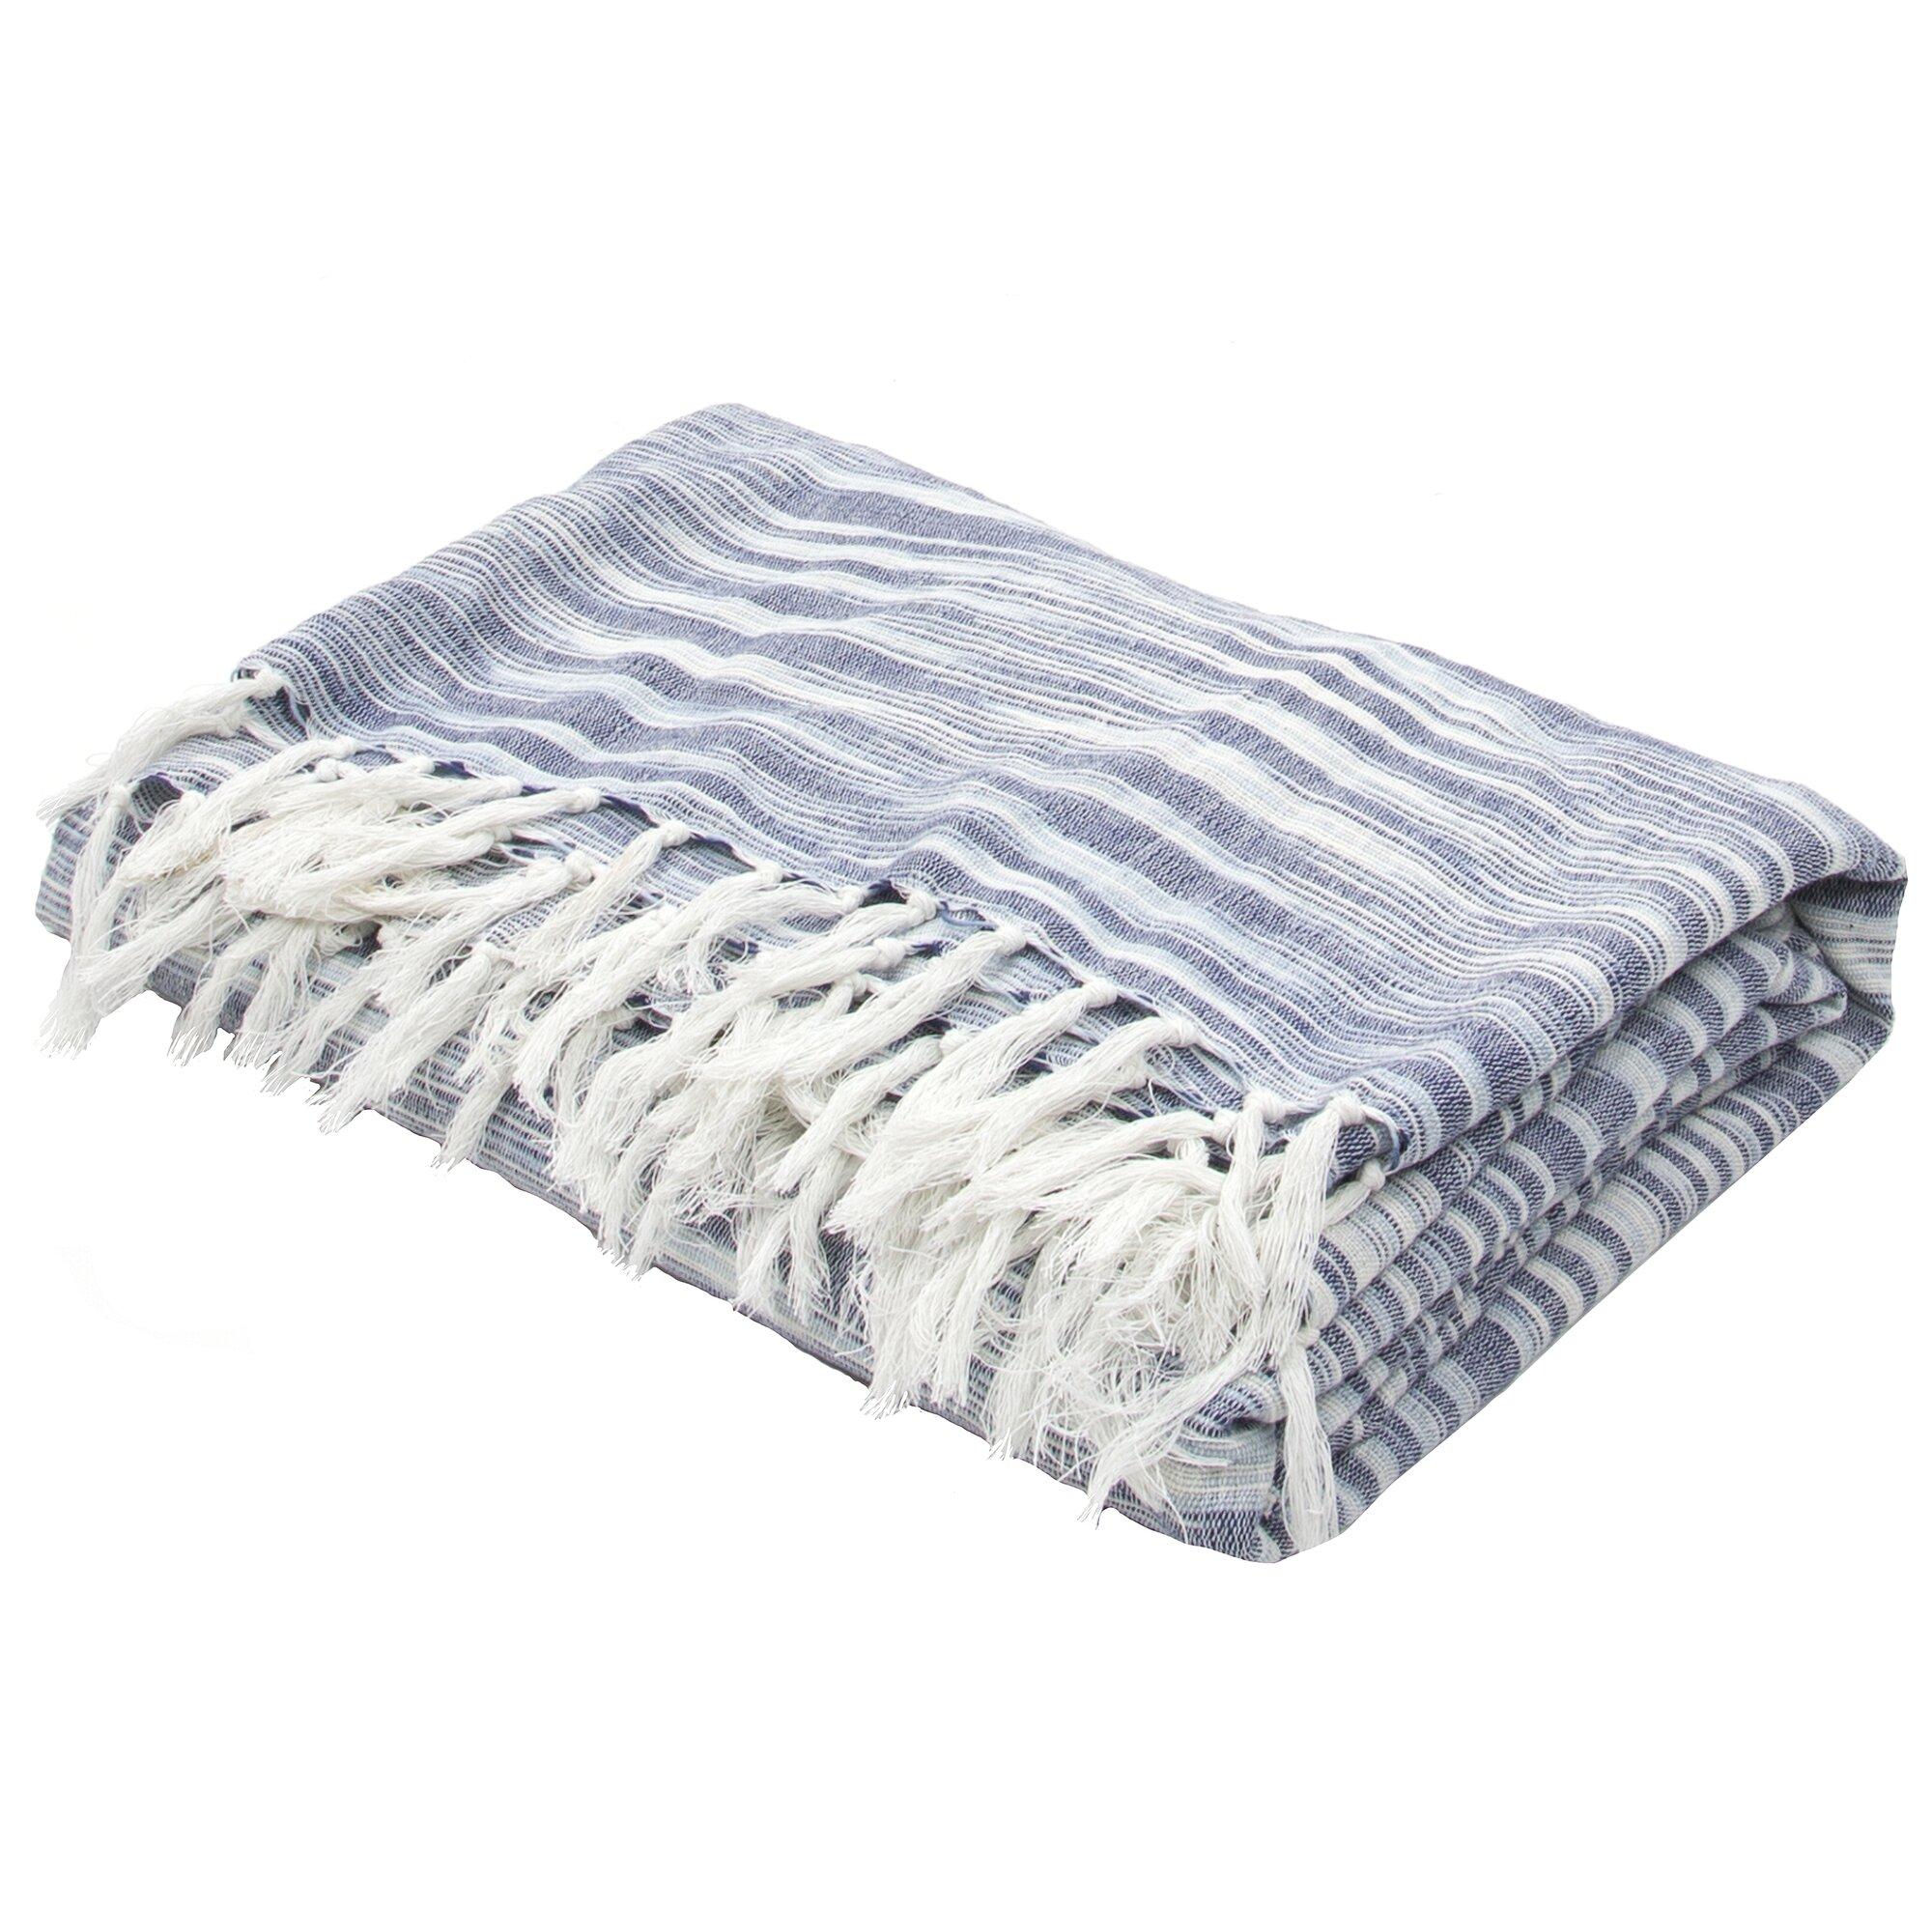 gattilier essential handloom modern throw blanket  reviews  - gattilier essential handloom modern throw blanket